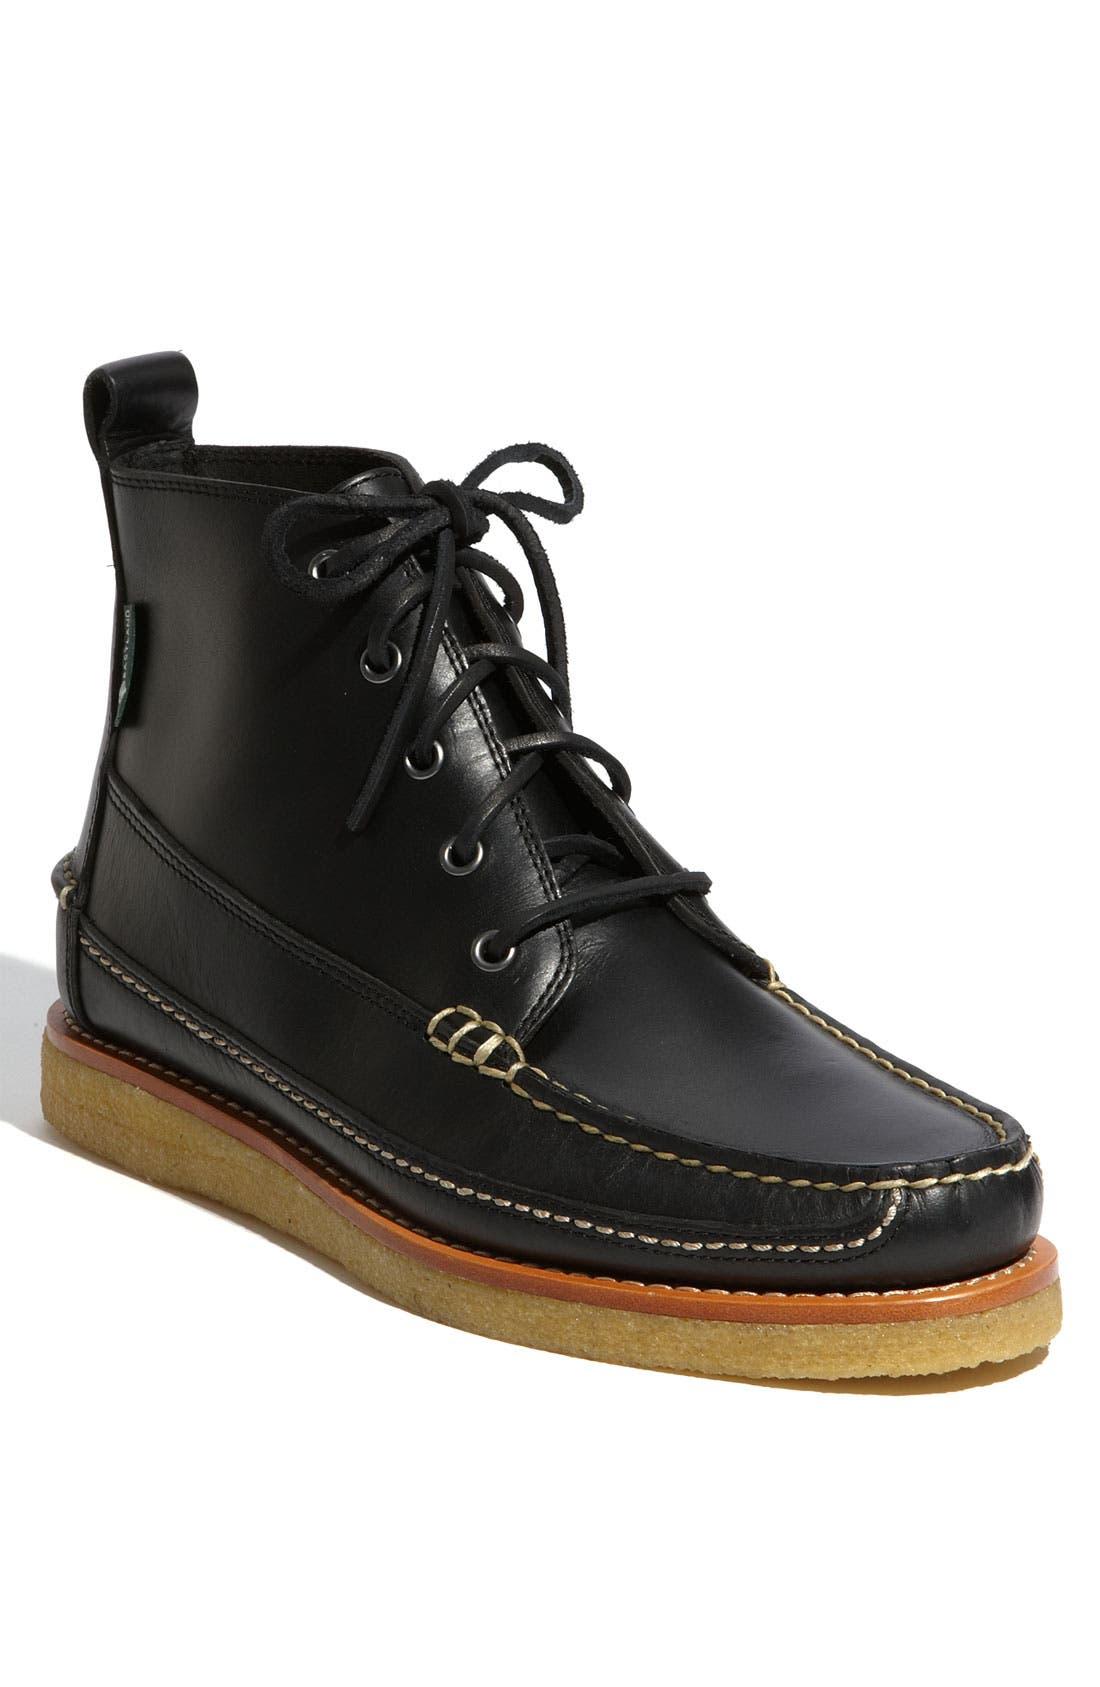 Alternate Image 1 Selected - Eastland 'Stonington 1955' Boot